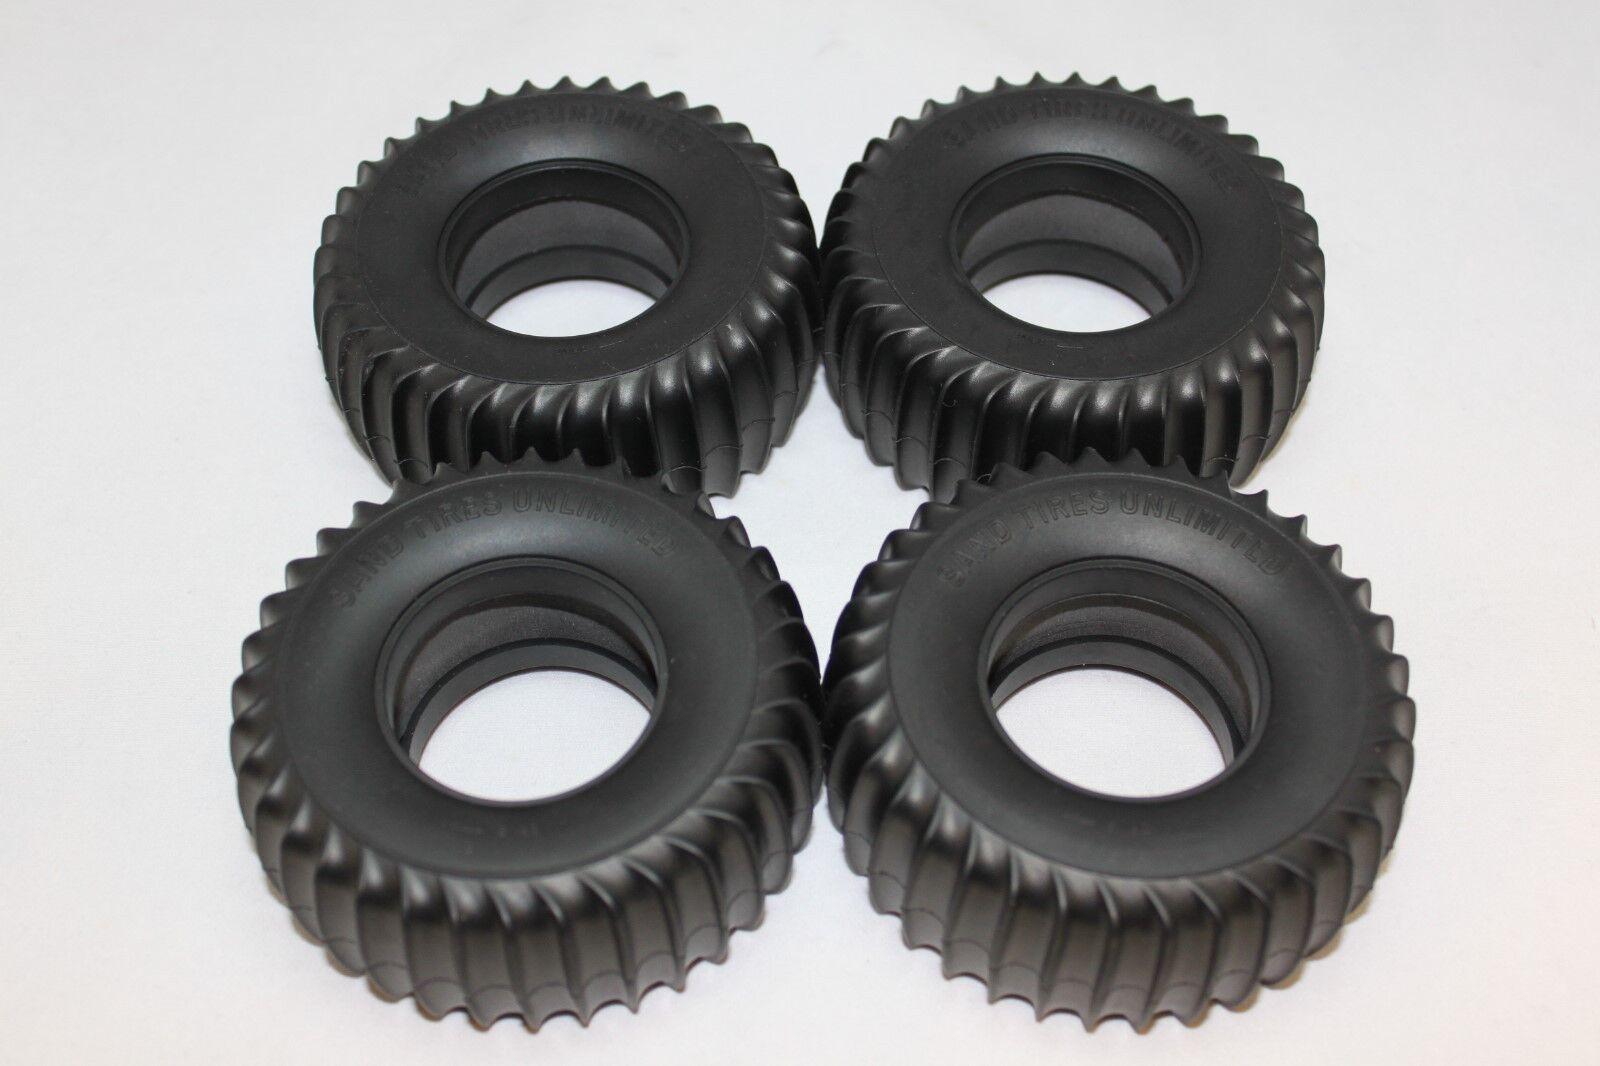 Tires set with inserts for Tamiya Blazing Blazer 58029 Wild Willy I 58035